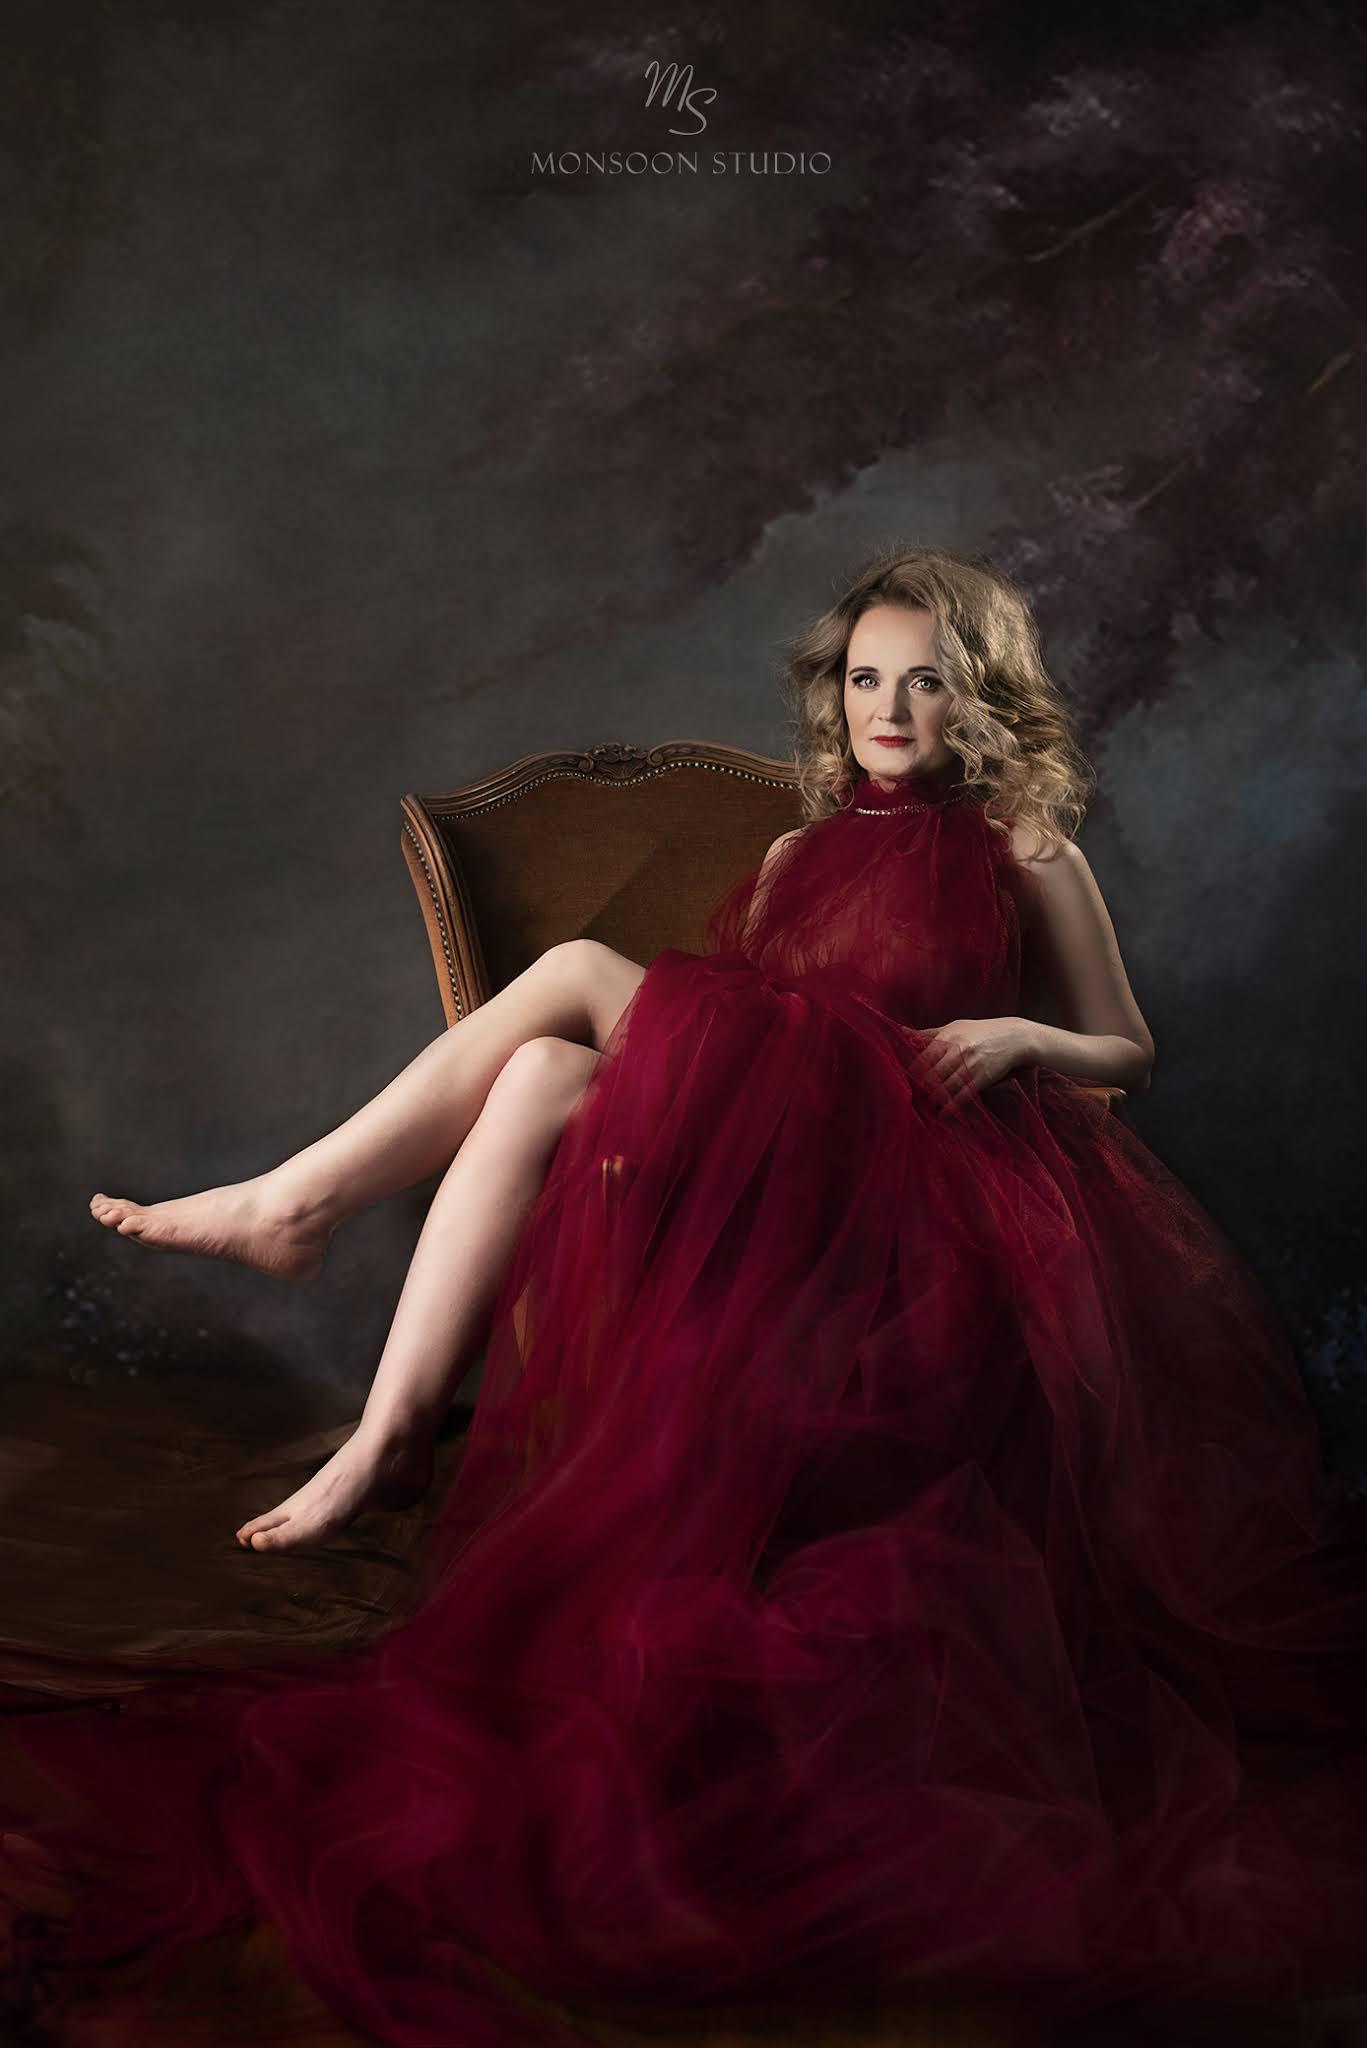 fotografia malarska, portret malarski, Warszawa, fotografia kobieca, sesje zdjęciowe Serock